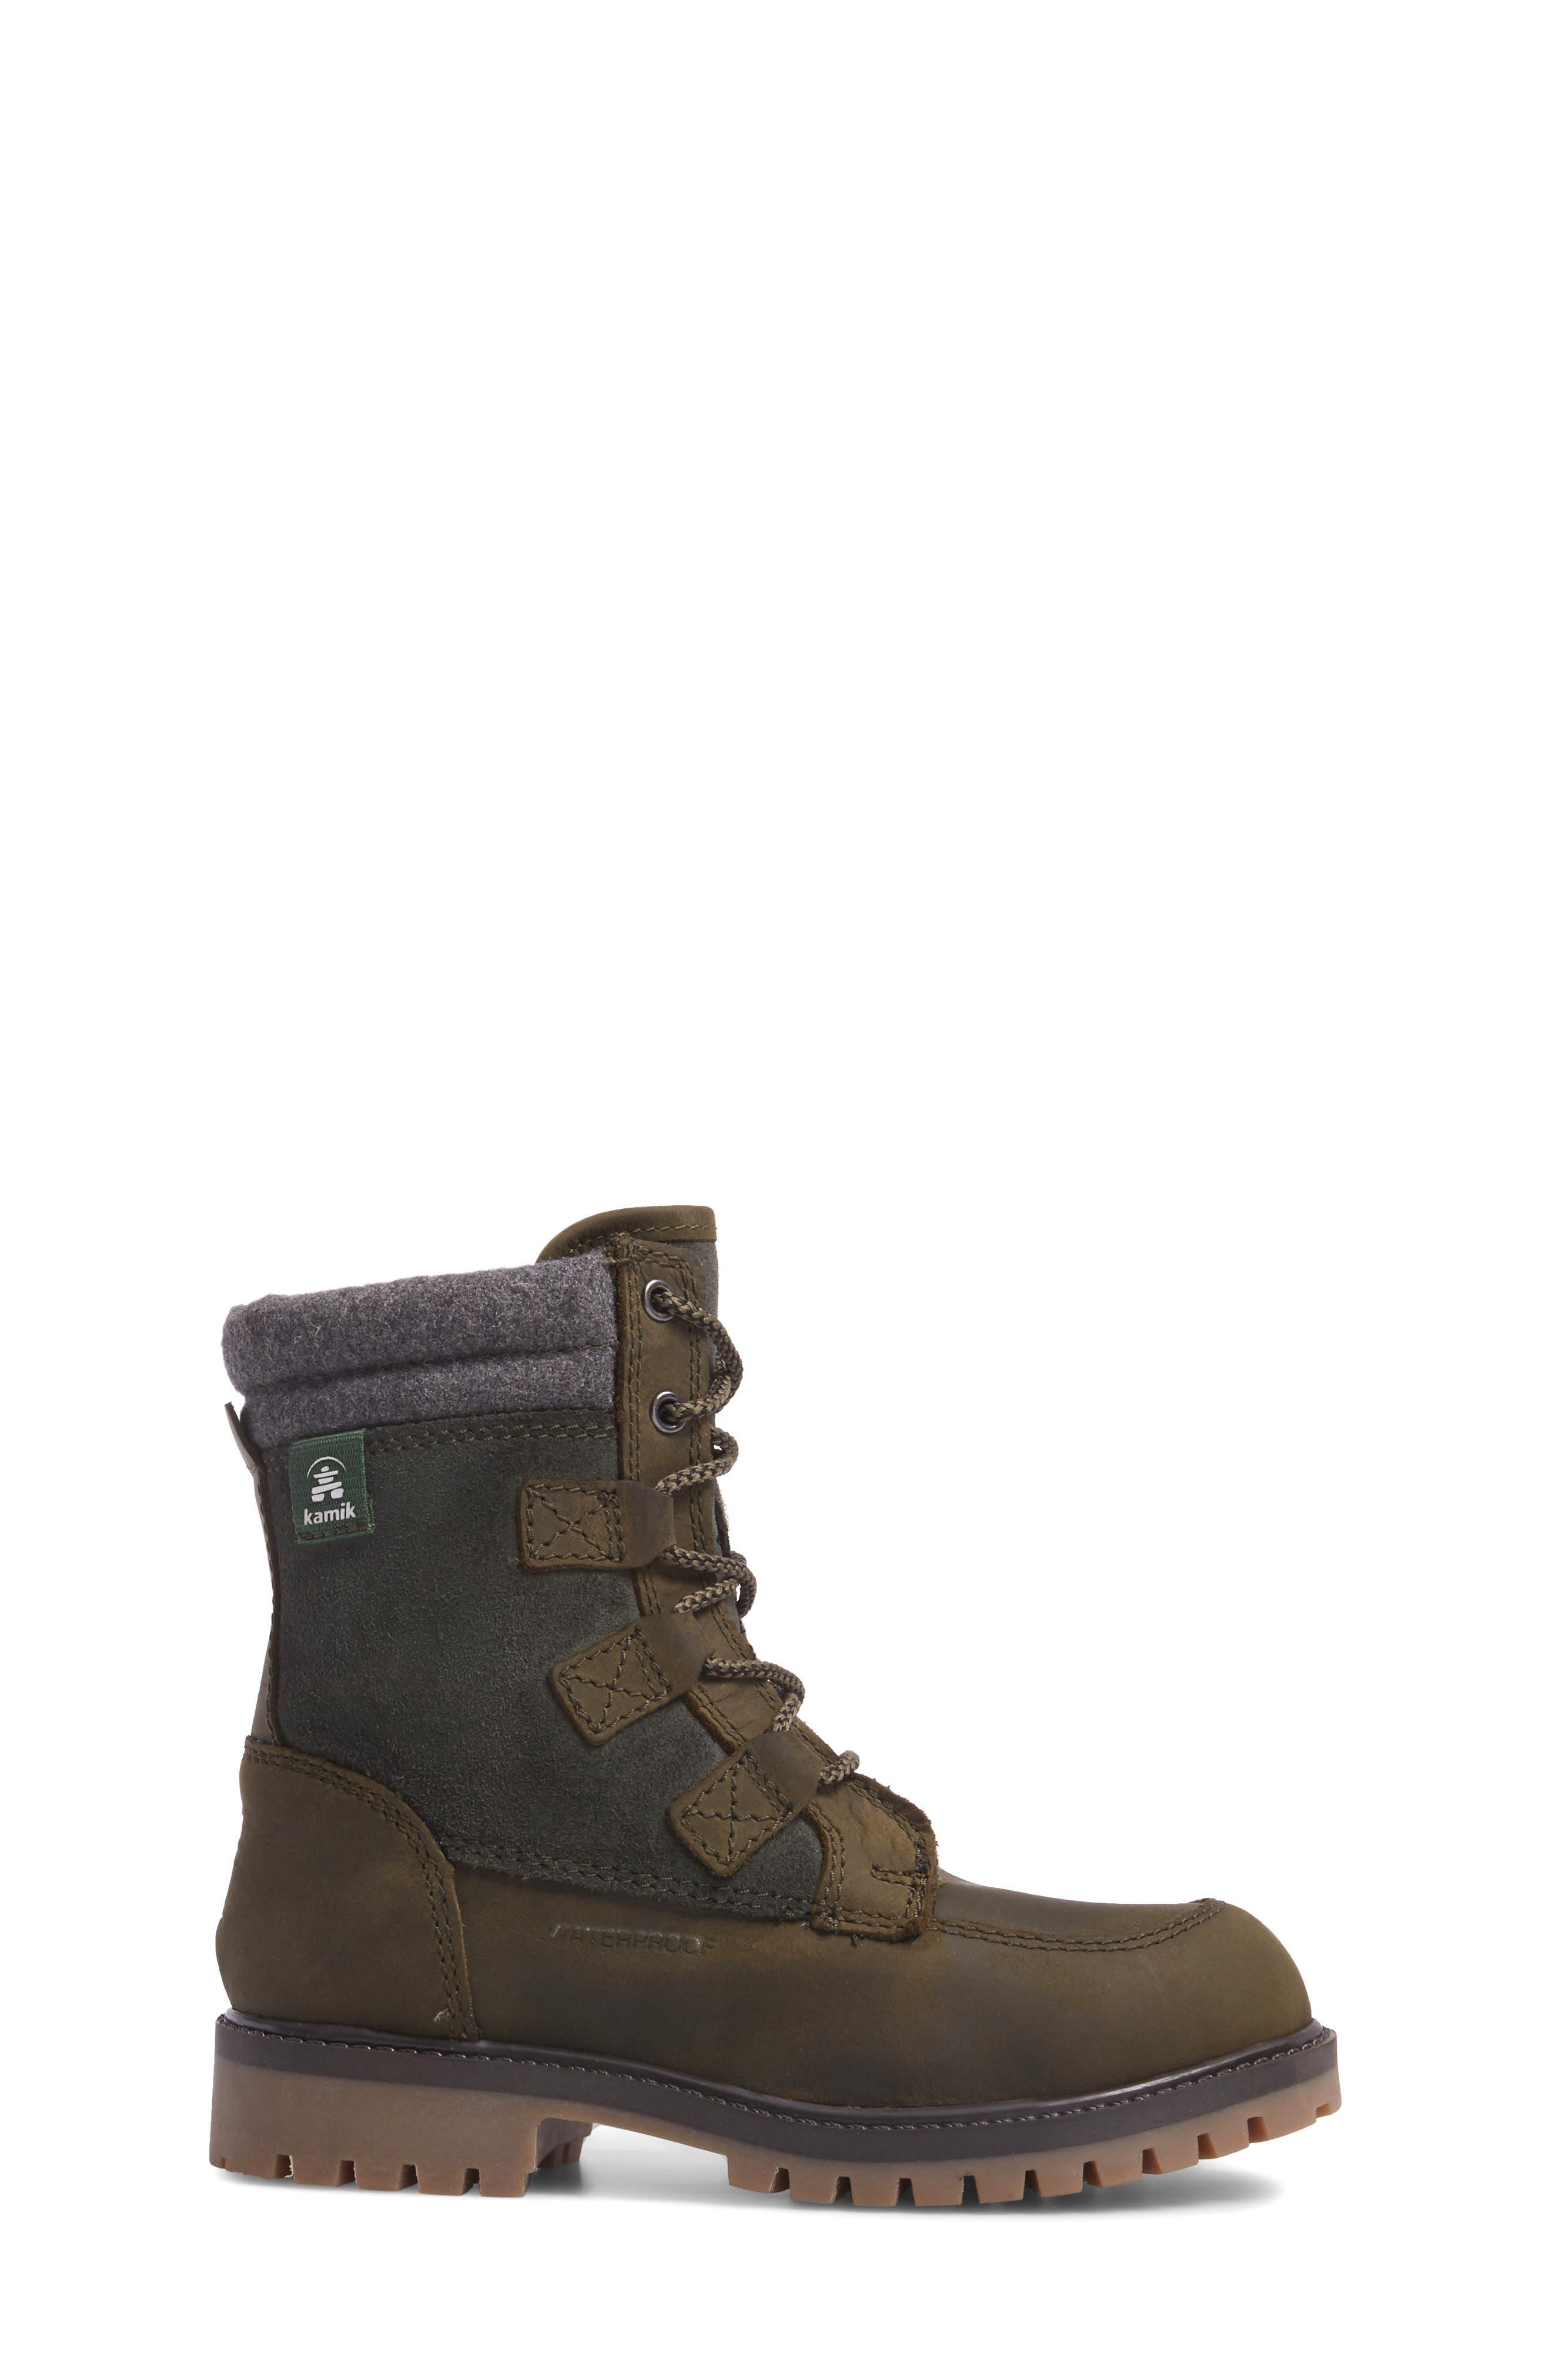 Takodalo Waterproof Boot,                             Alternate thumbnail 3, color,                             Olive